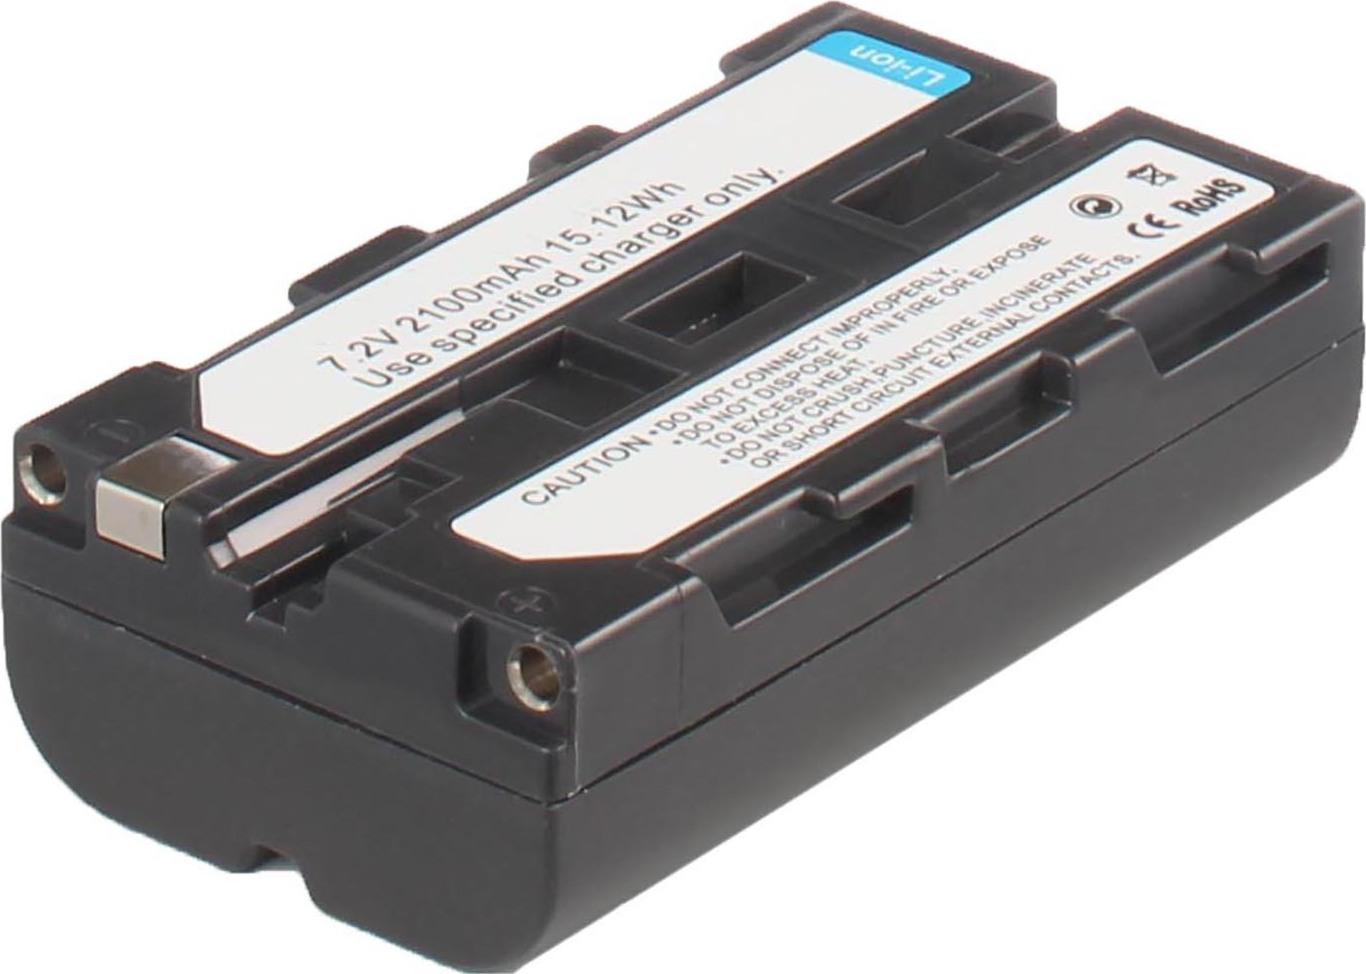 Аккумуляторная батарея iBatt iB-T2-F278 2000mAh для камер Sony CCD-TRV59E, CCD-TR411E, CCD-TR617E, DCR-TRV320E, DCR-VX2000E, DCR-VX2100, HVL-20DW2, DCR-VX2000, CCD-TR412E, CCD-TR427E, CCD-TRV87E, DCR-TRV120E, CCD-TR511E, CCD-TR730E, CCD-TRV78E,